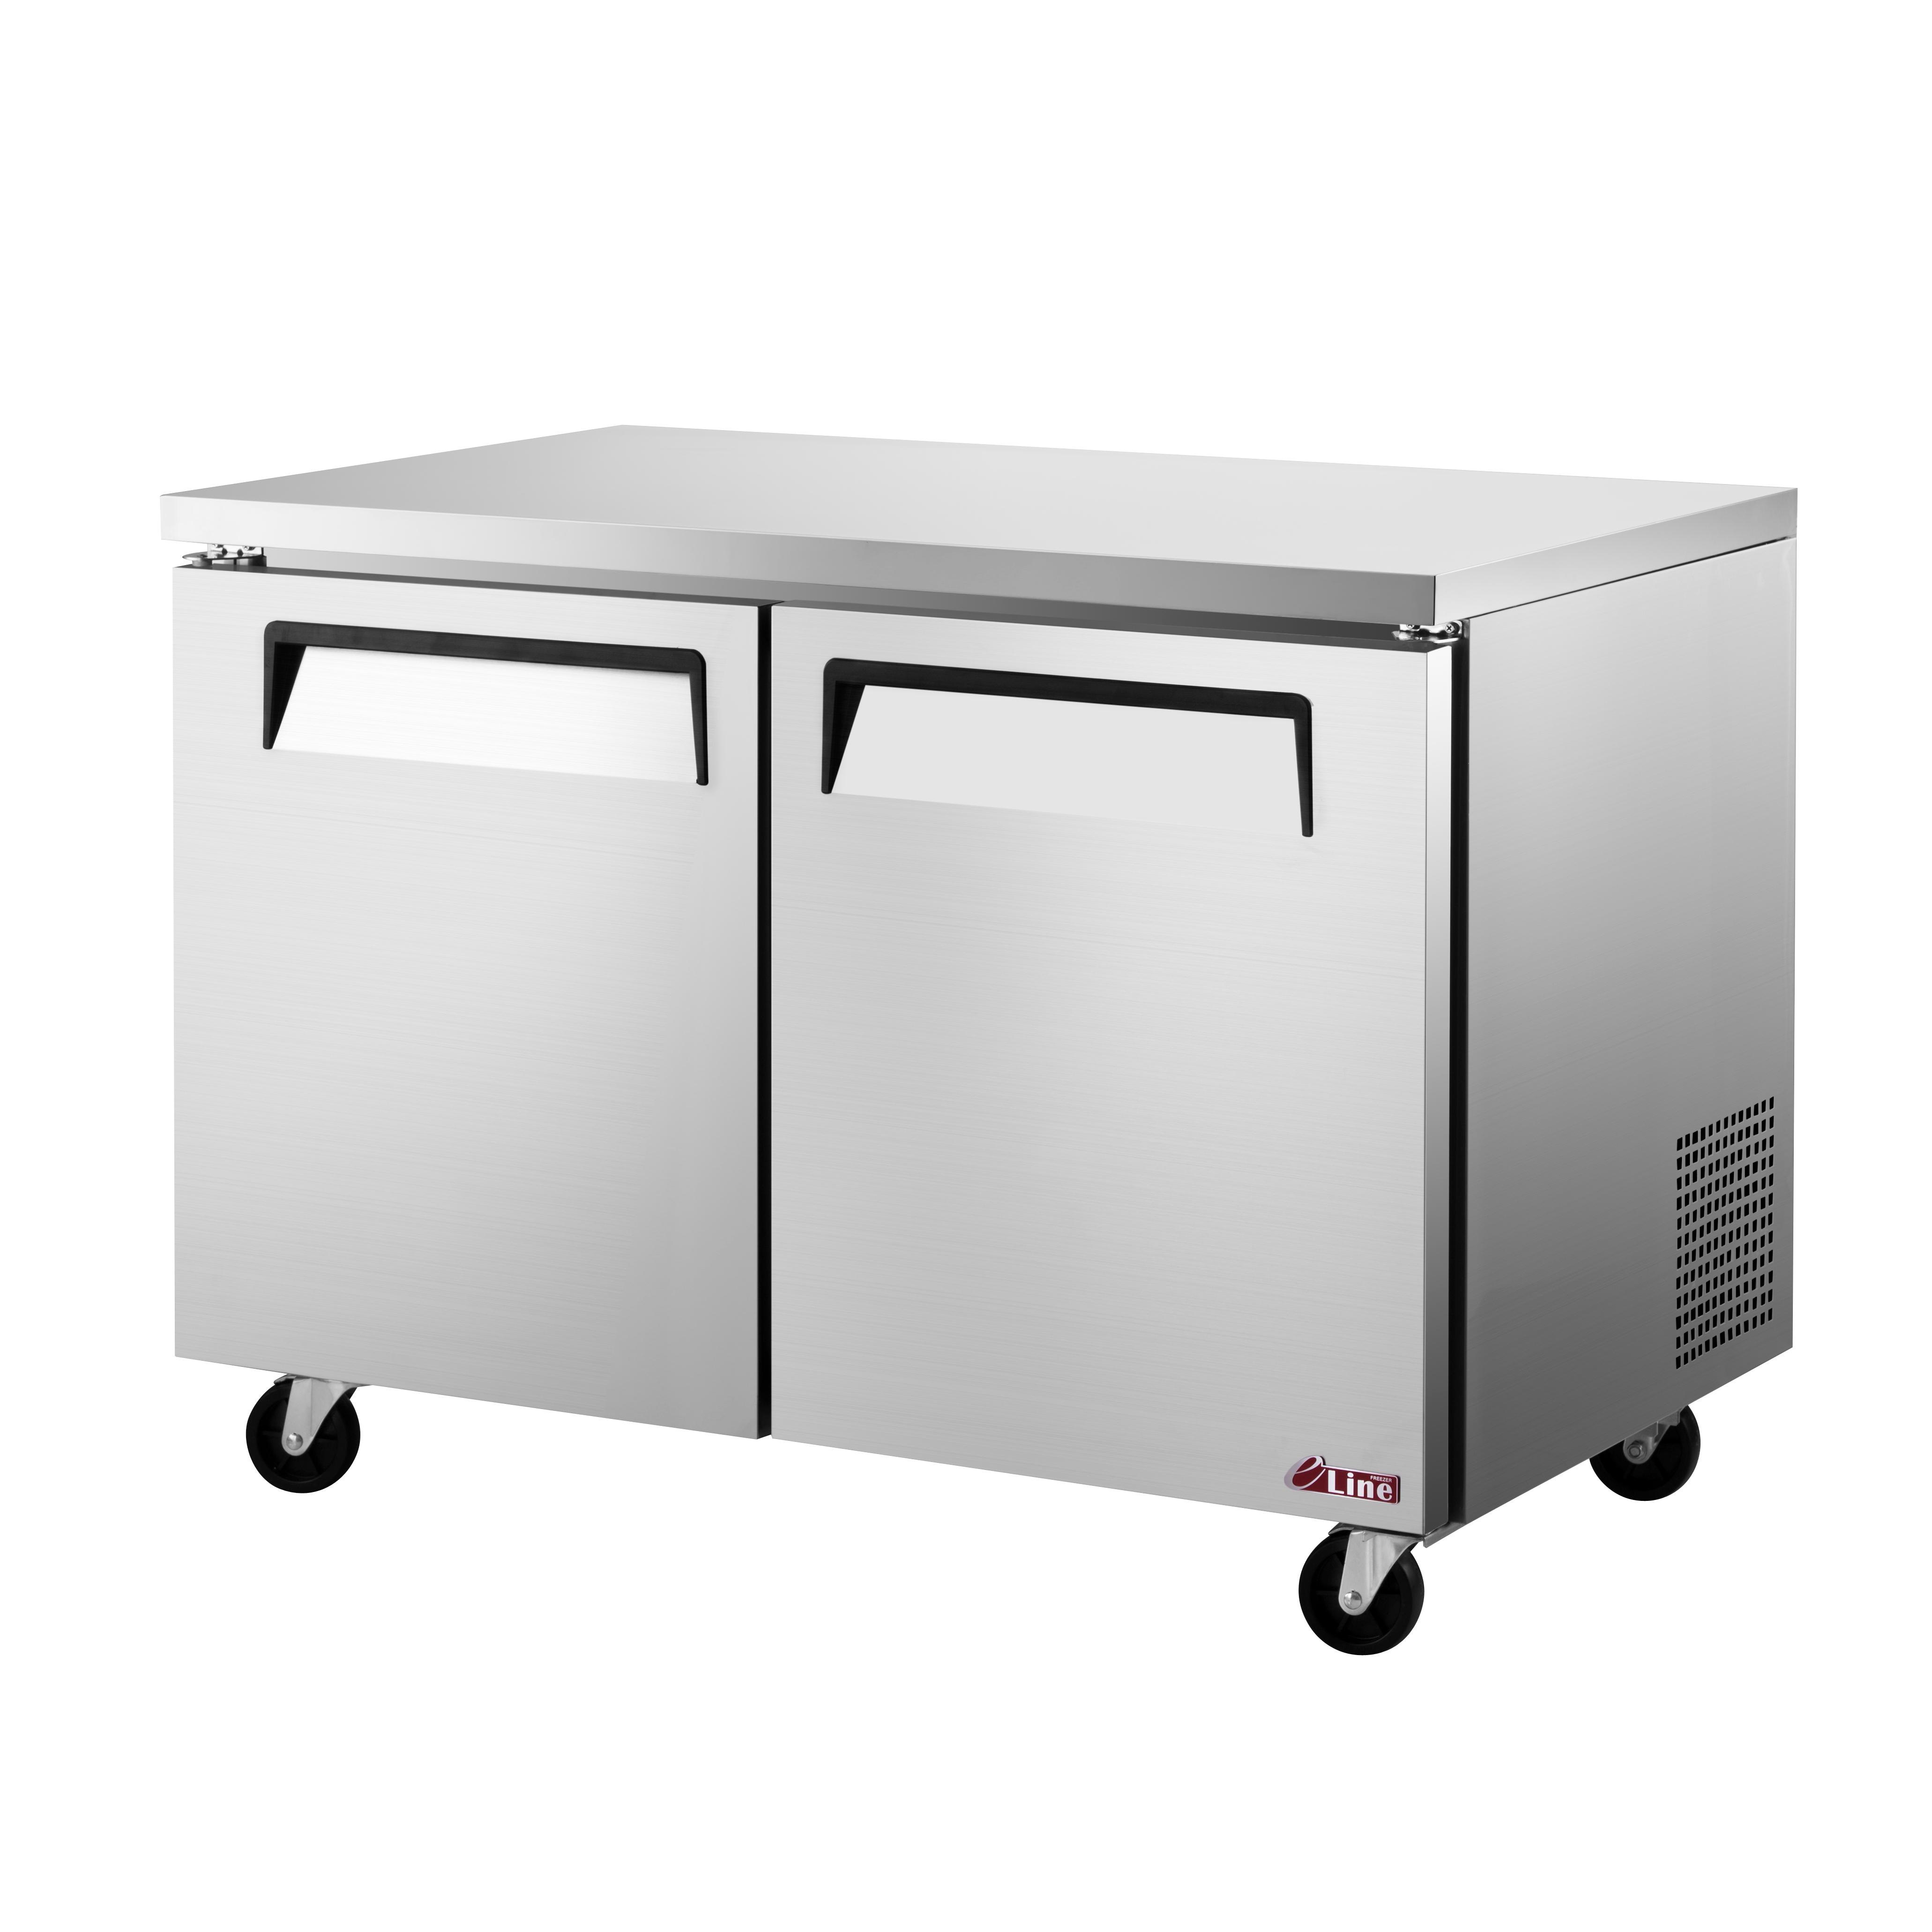 Turbo Air EUF-48-N freezer, undercounter, reach-in